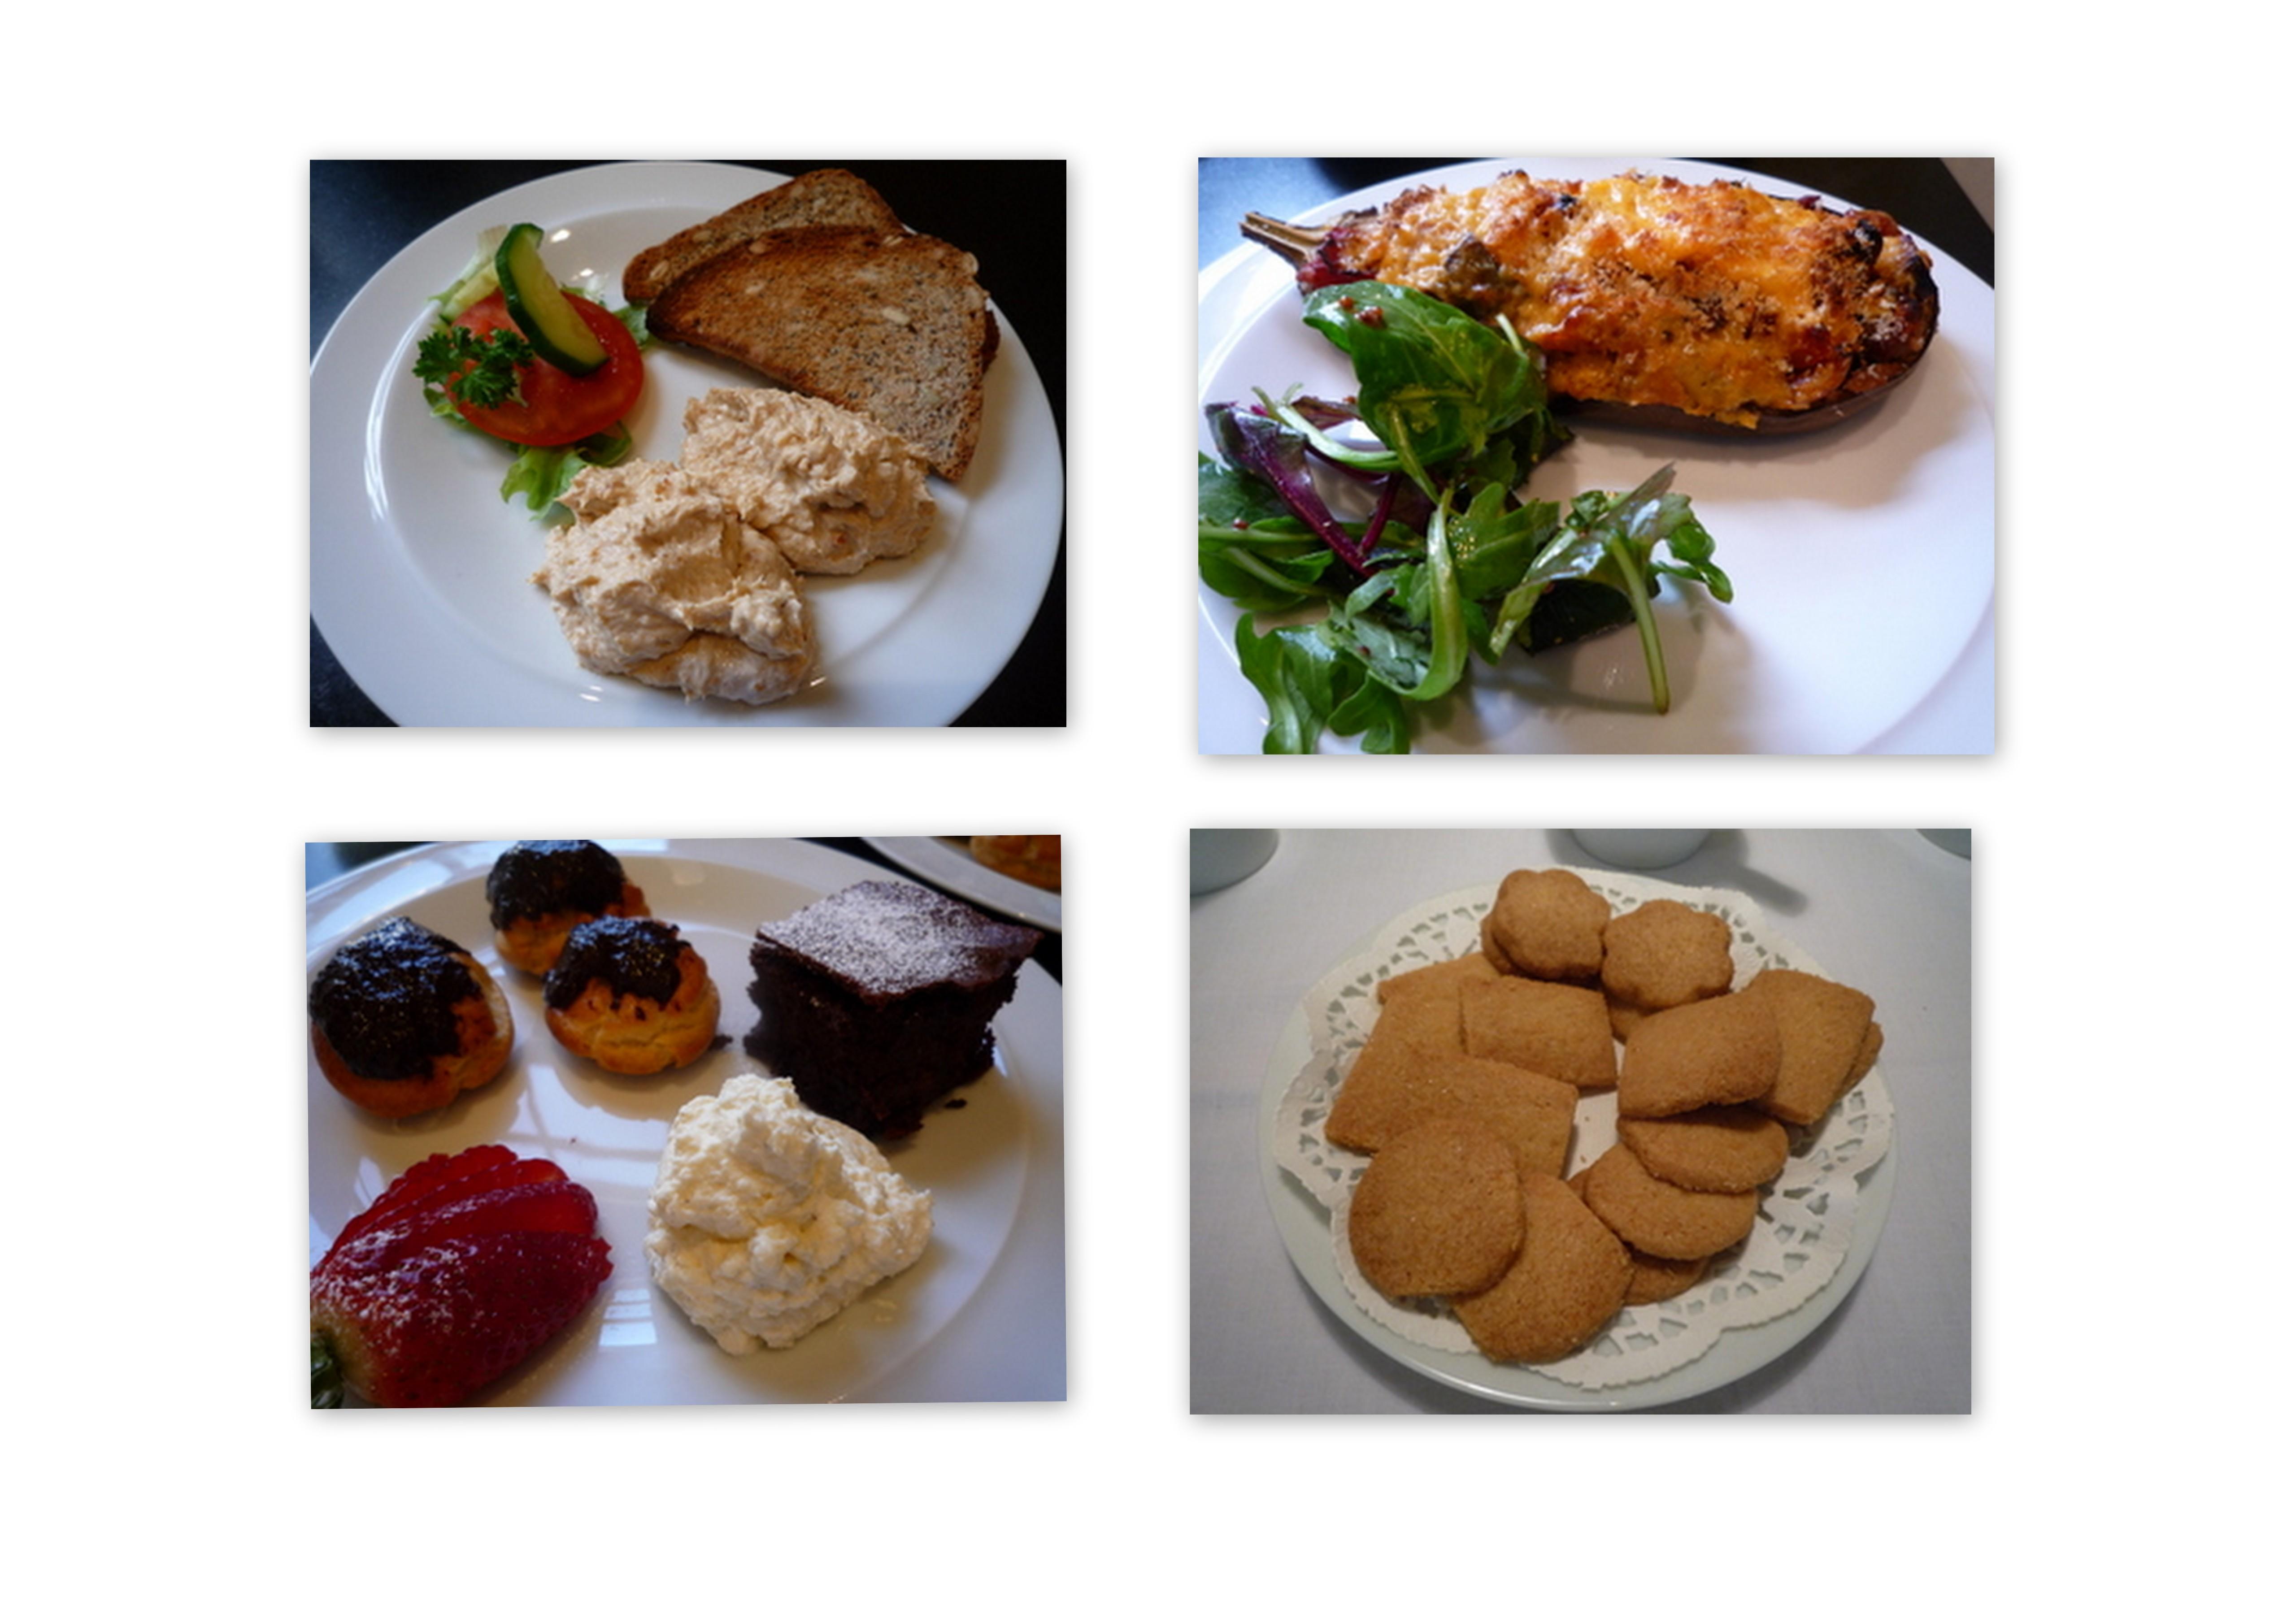 20130427 Chez Shamwari lunch with Dot & ladies_small files